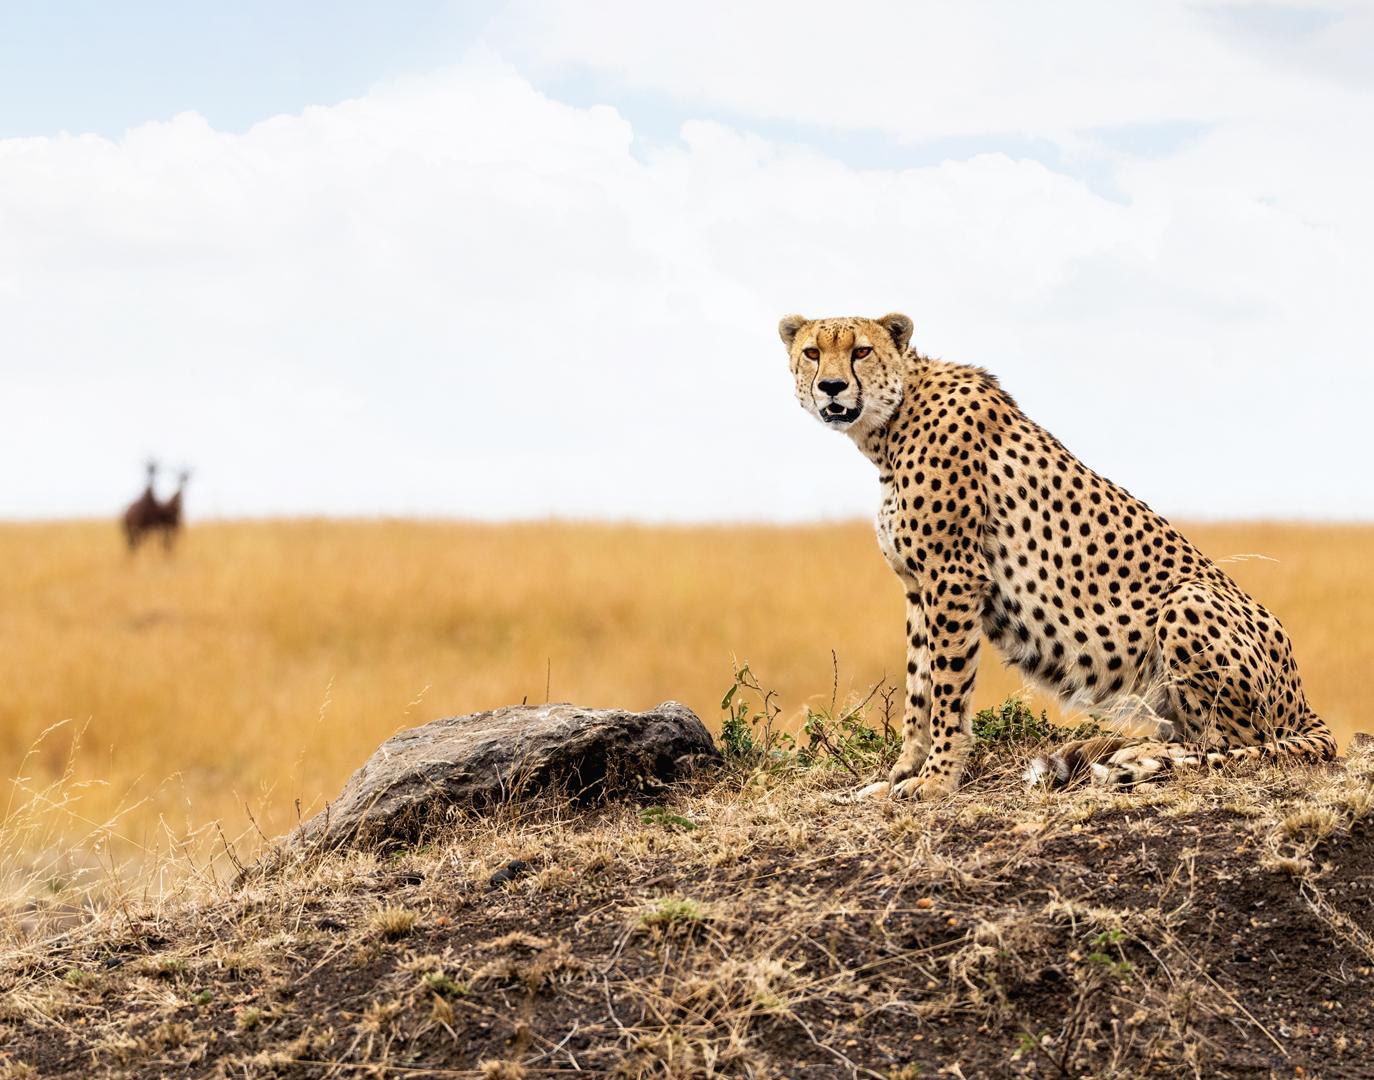 Cheetah in Africa Looking Into Camera.jpg